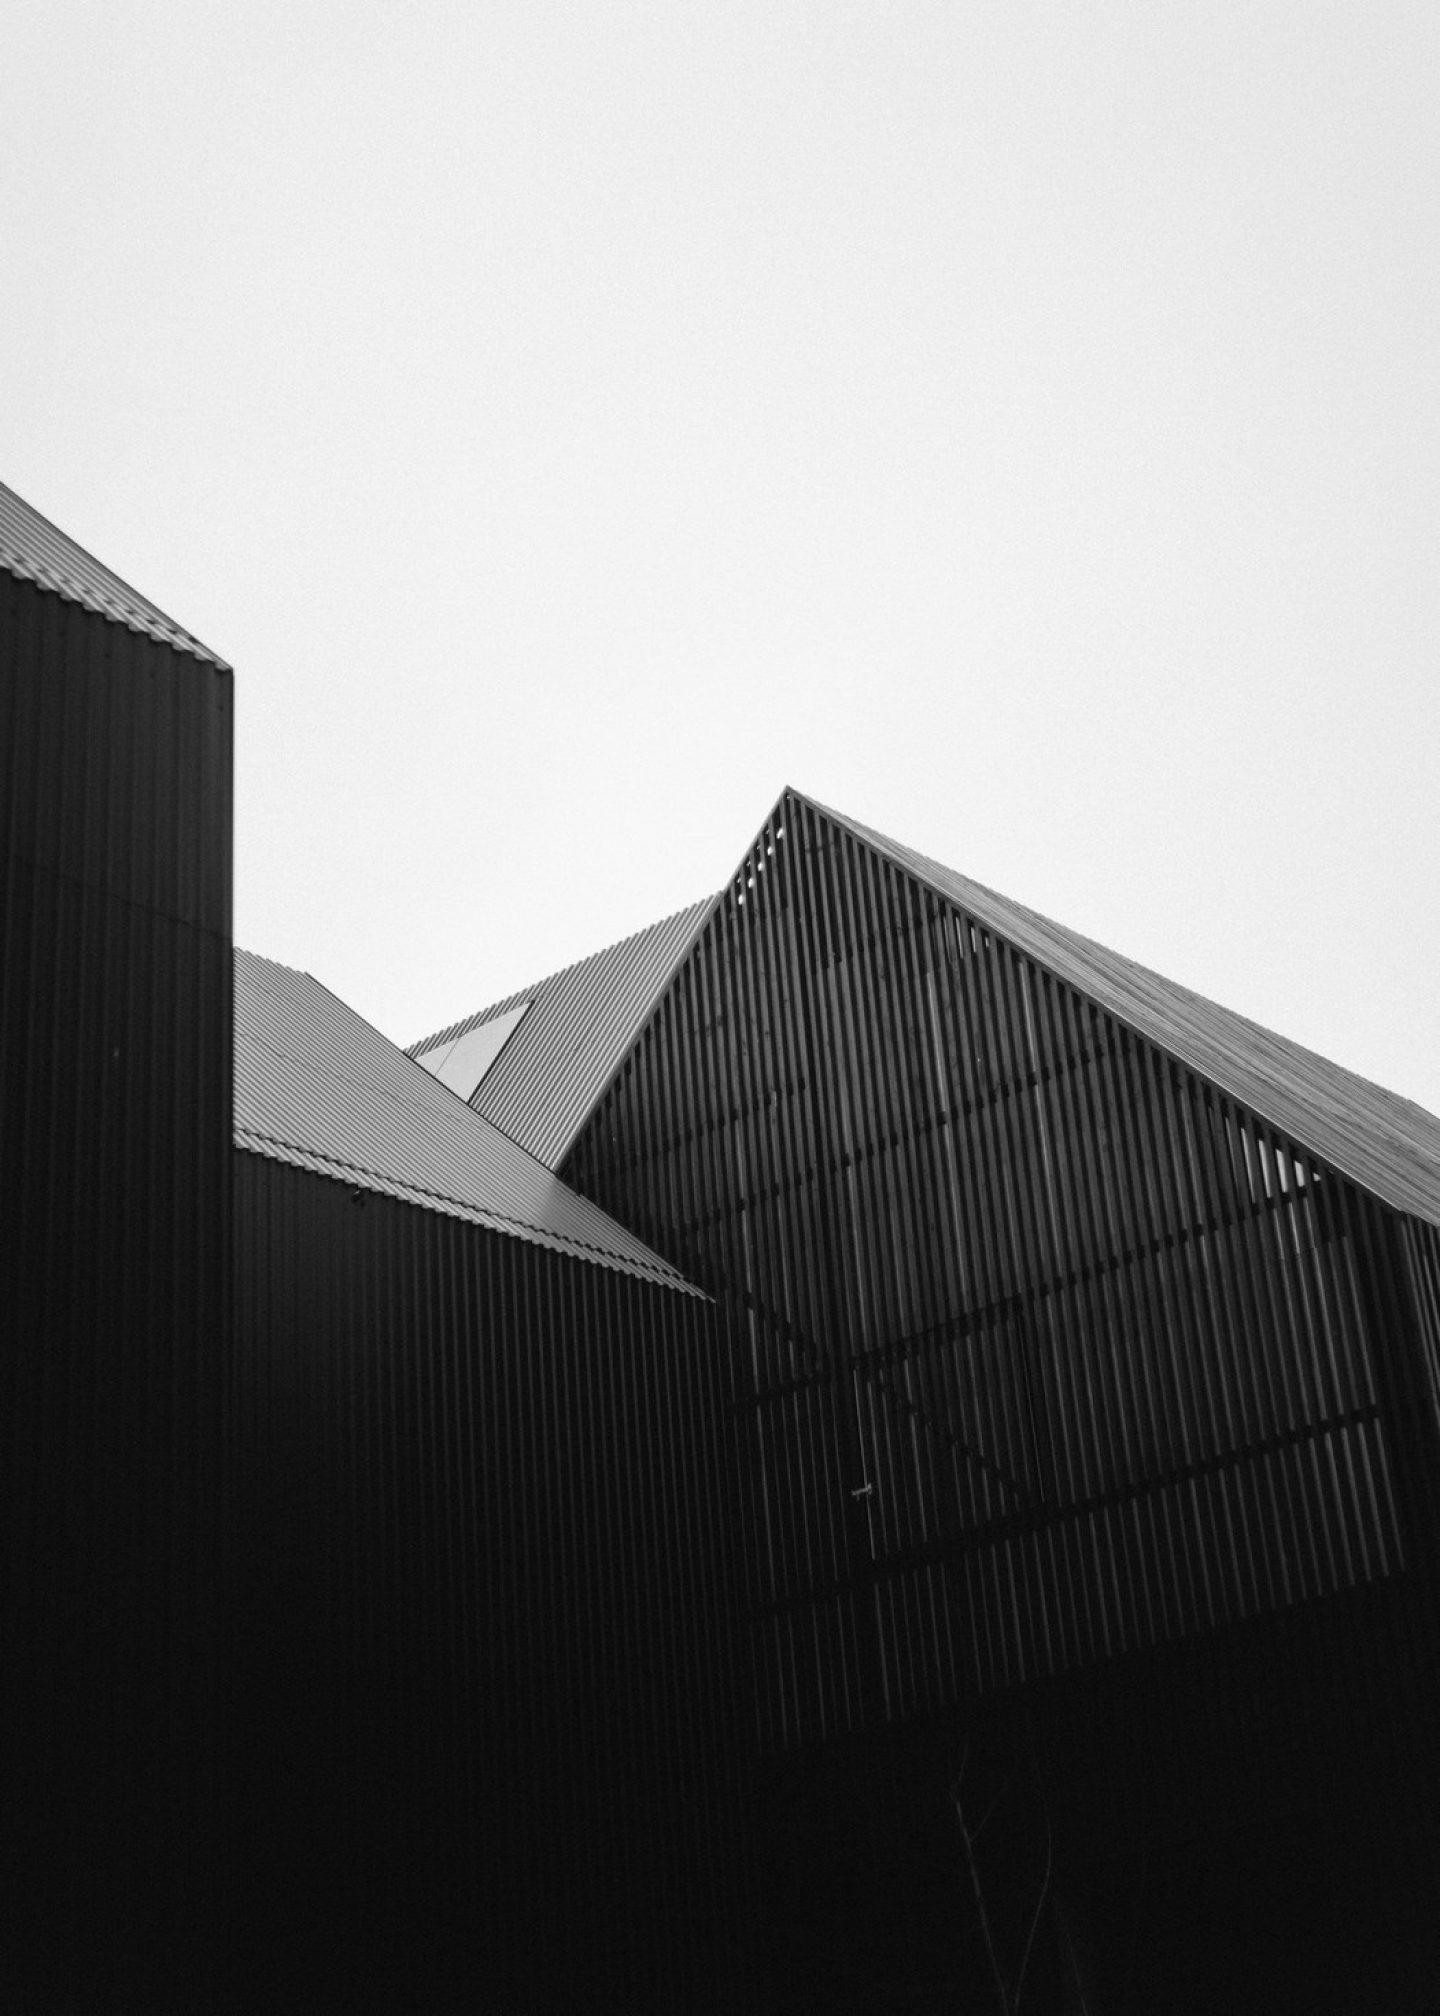 kim_holtermand_architecture-7-kopiowanie